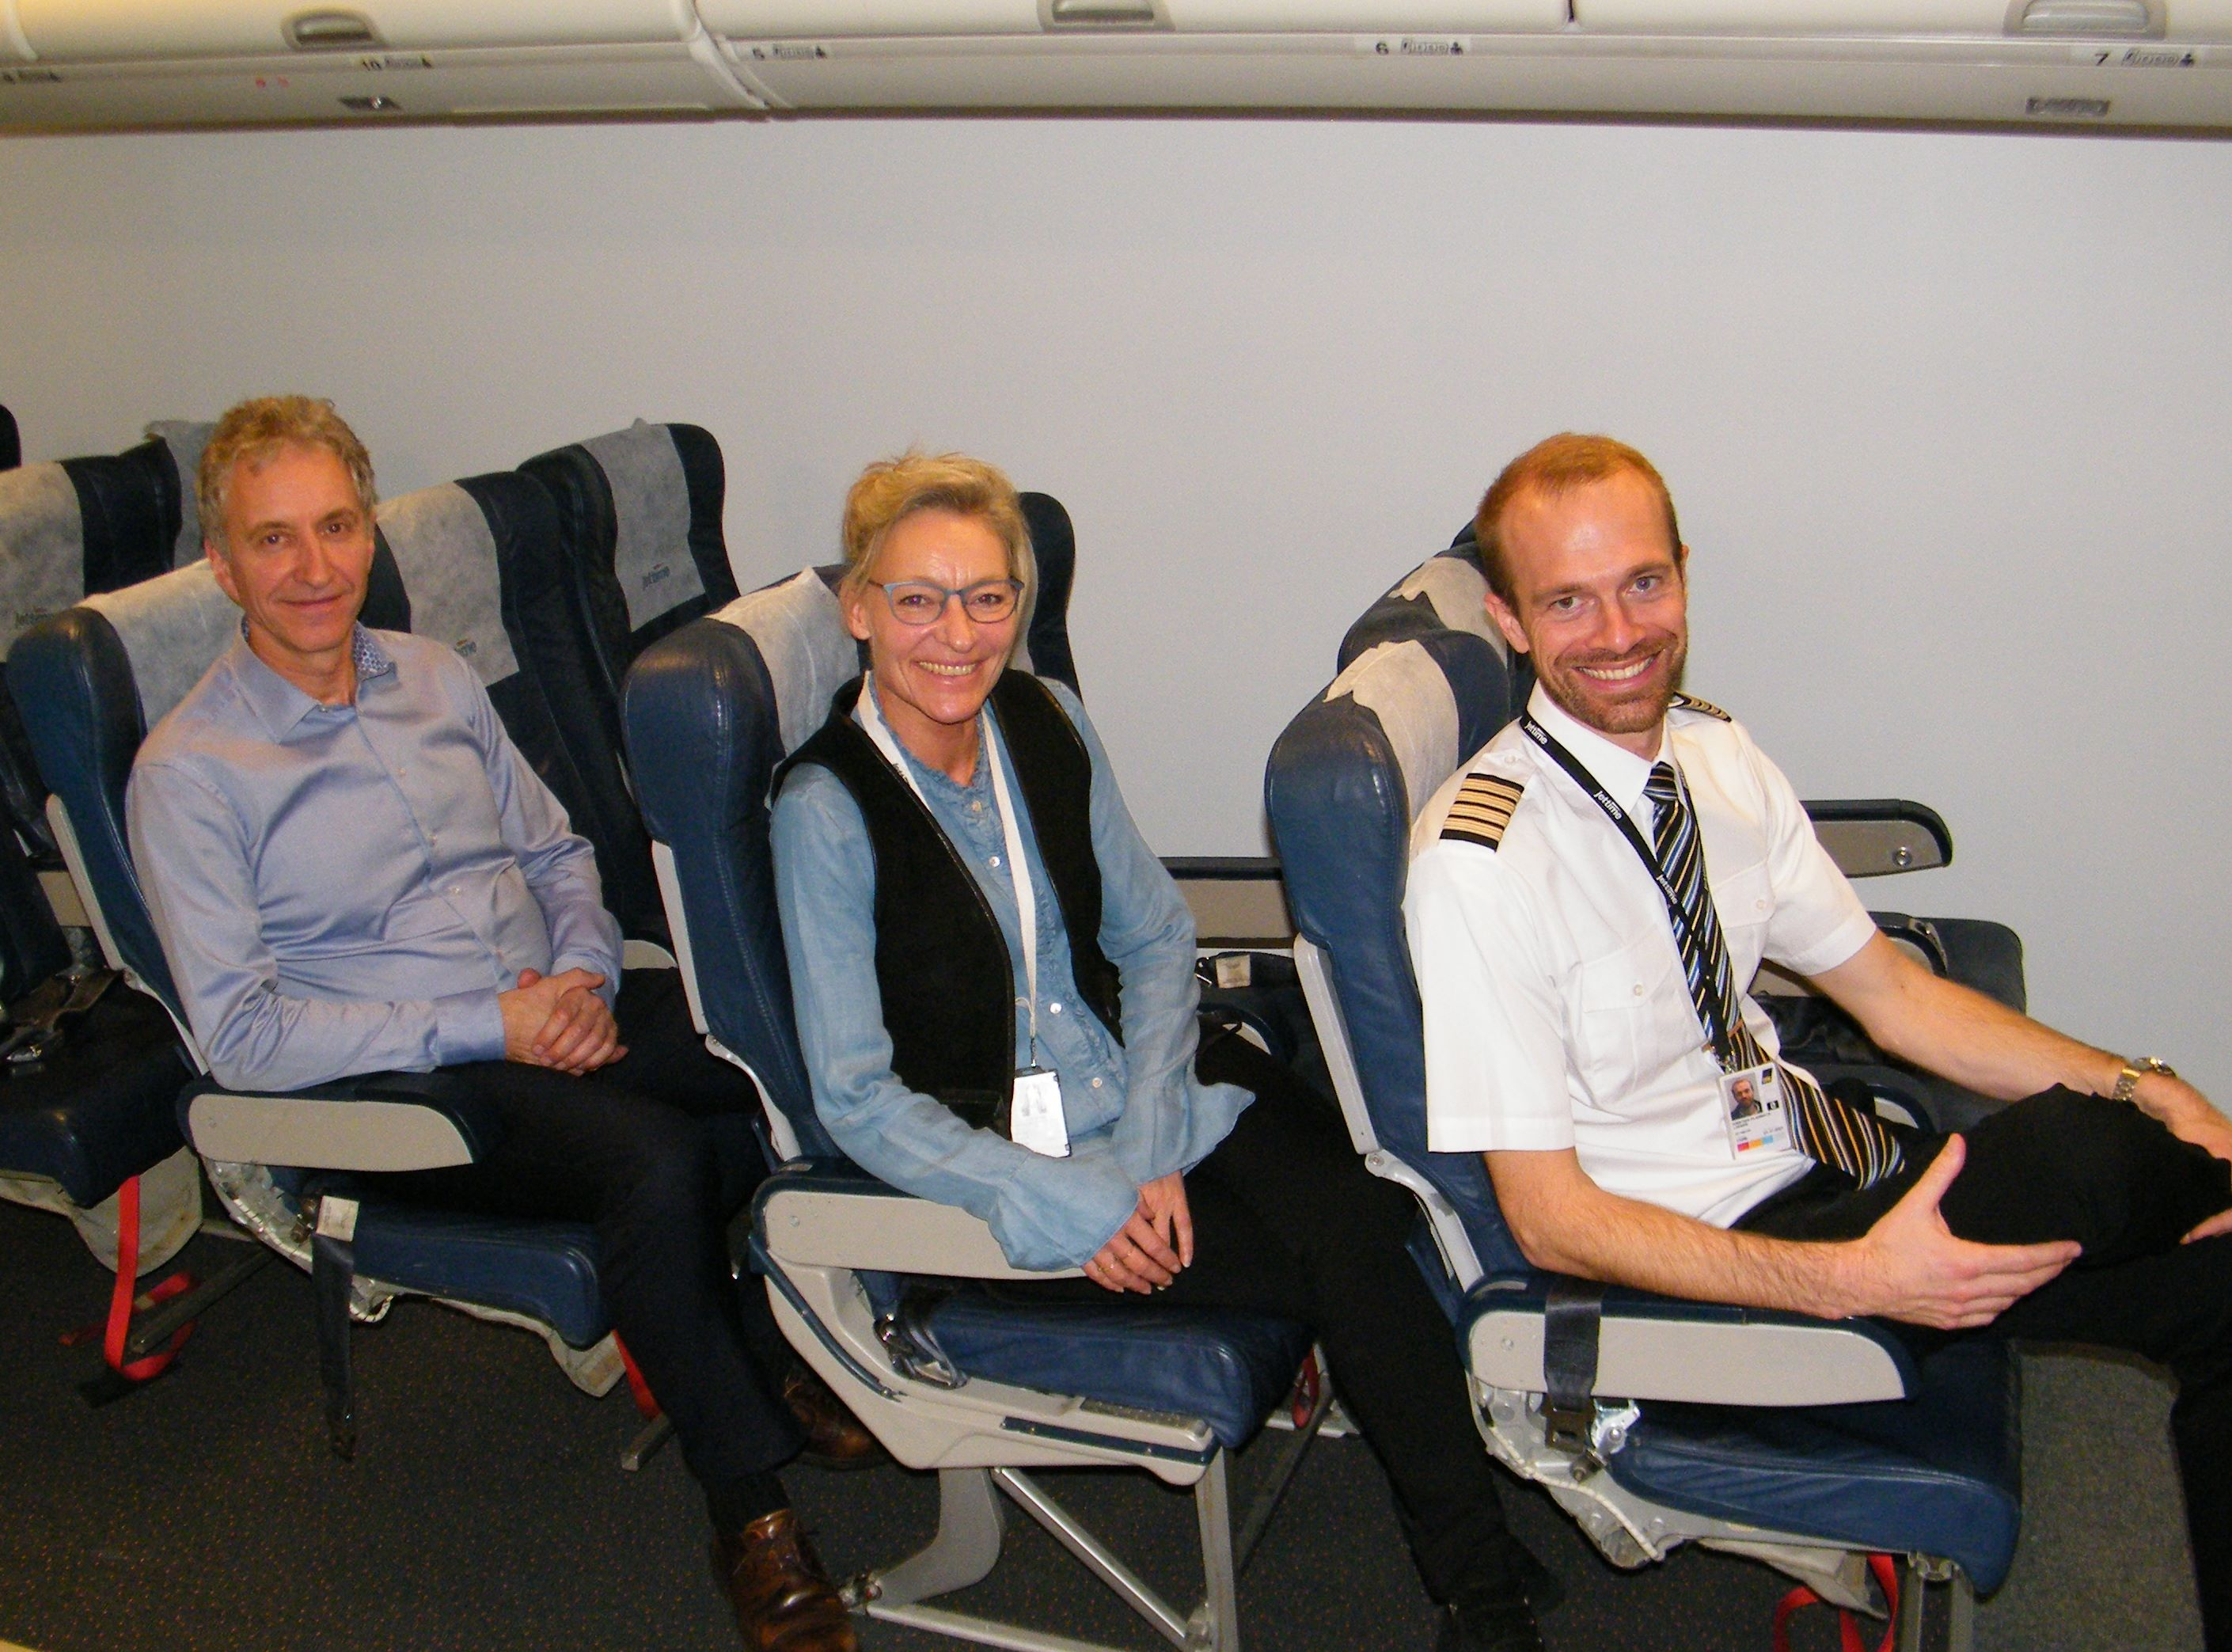 Trioen fra Jet Time ved sammenkomsten med Danske Flyvejournalister, fra venstre administrerende direktør Jørgen Holme, vicedirektør Birthe Madsen og chefpilot Kristian Plambeck Lassen. Foto: Henrik Baumgarten.